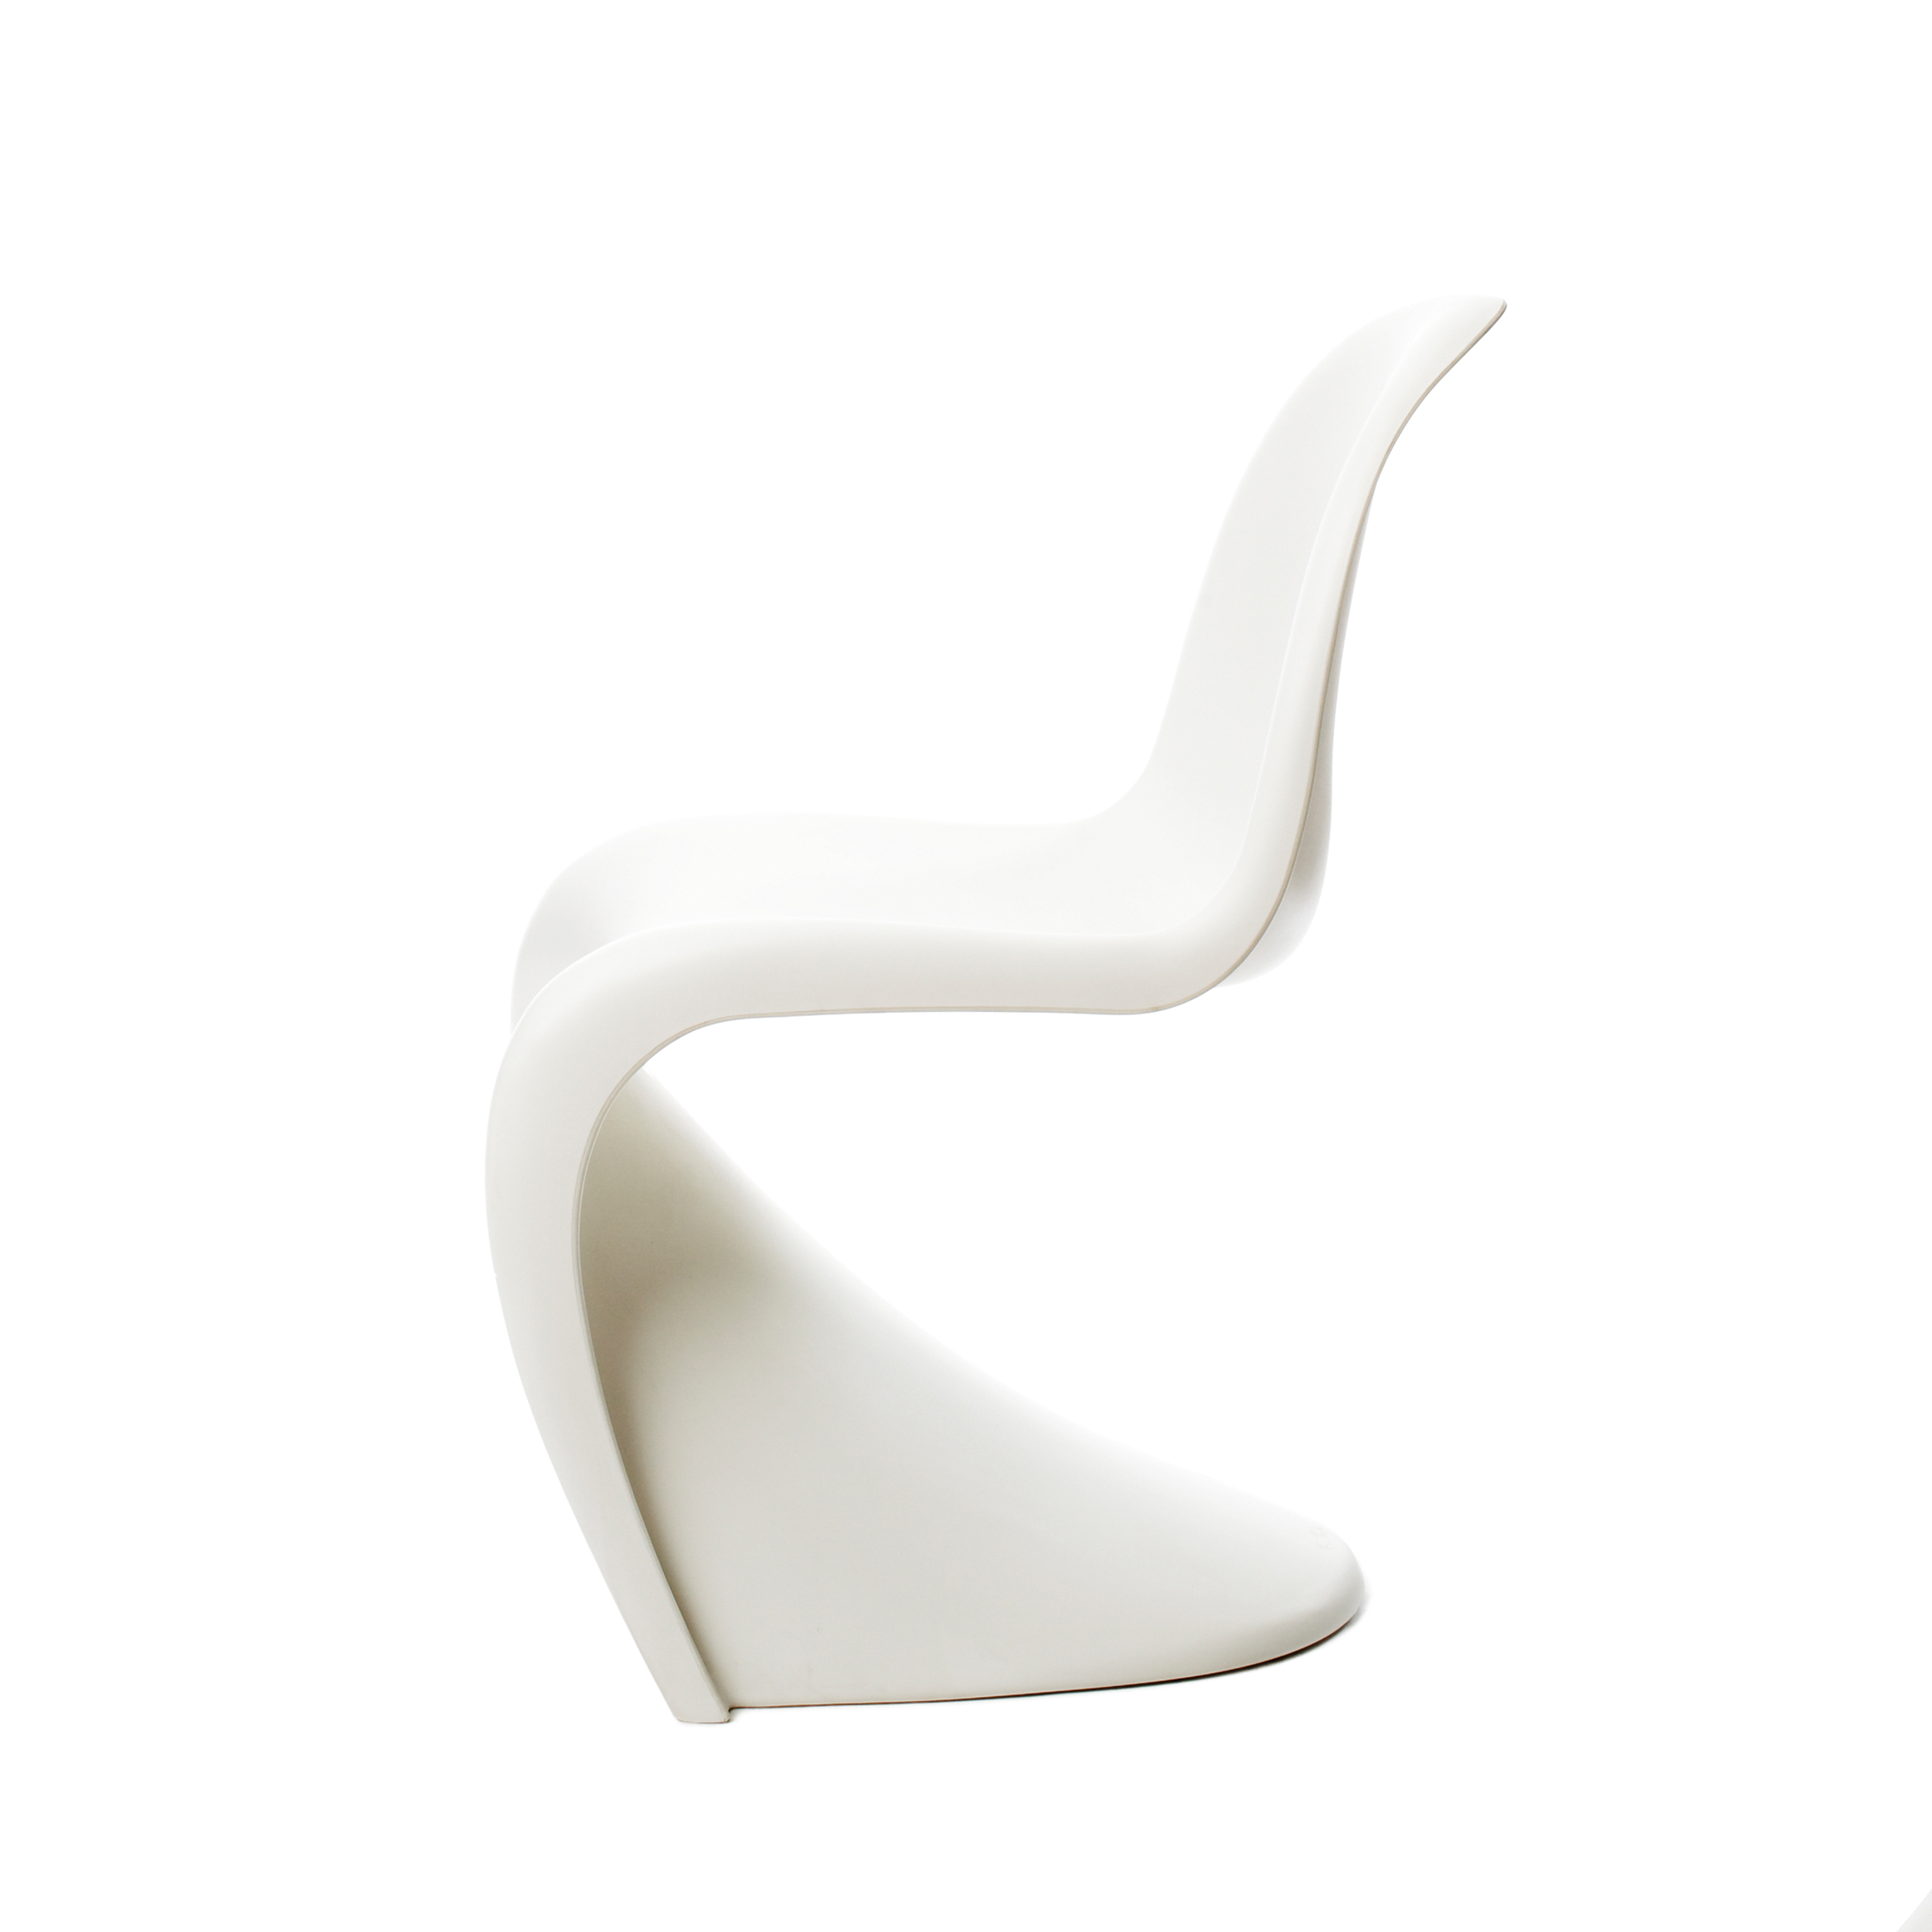 vitra stuhl panton chair